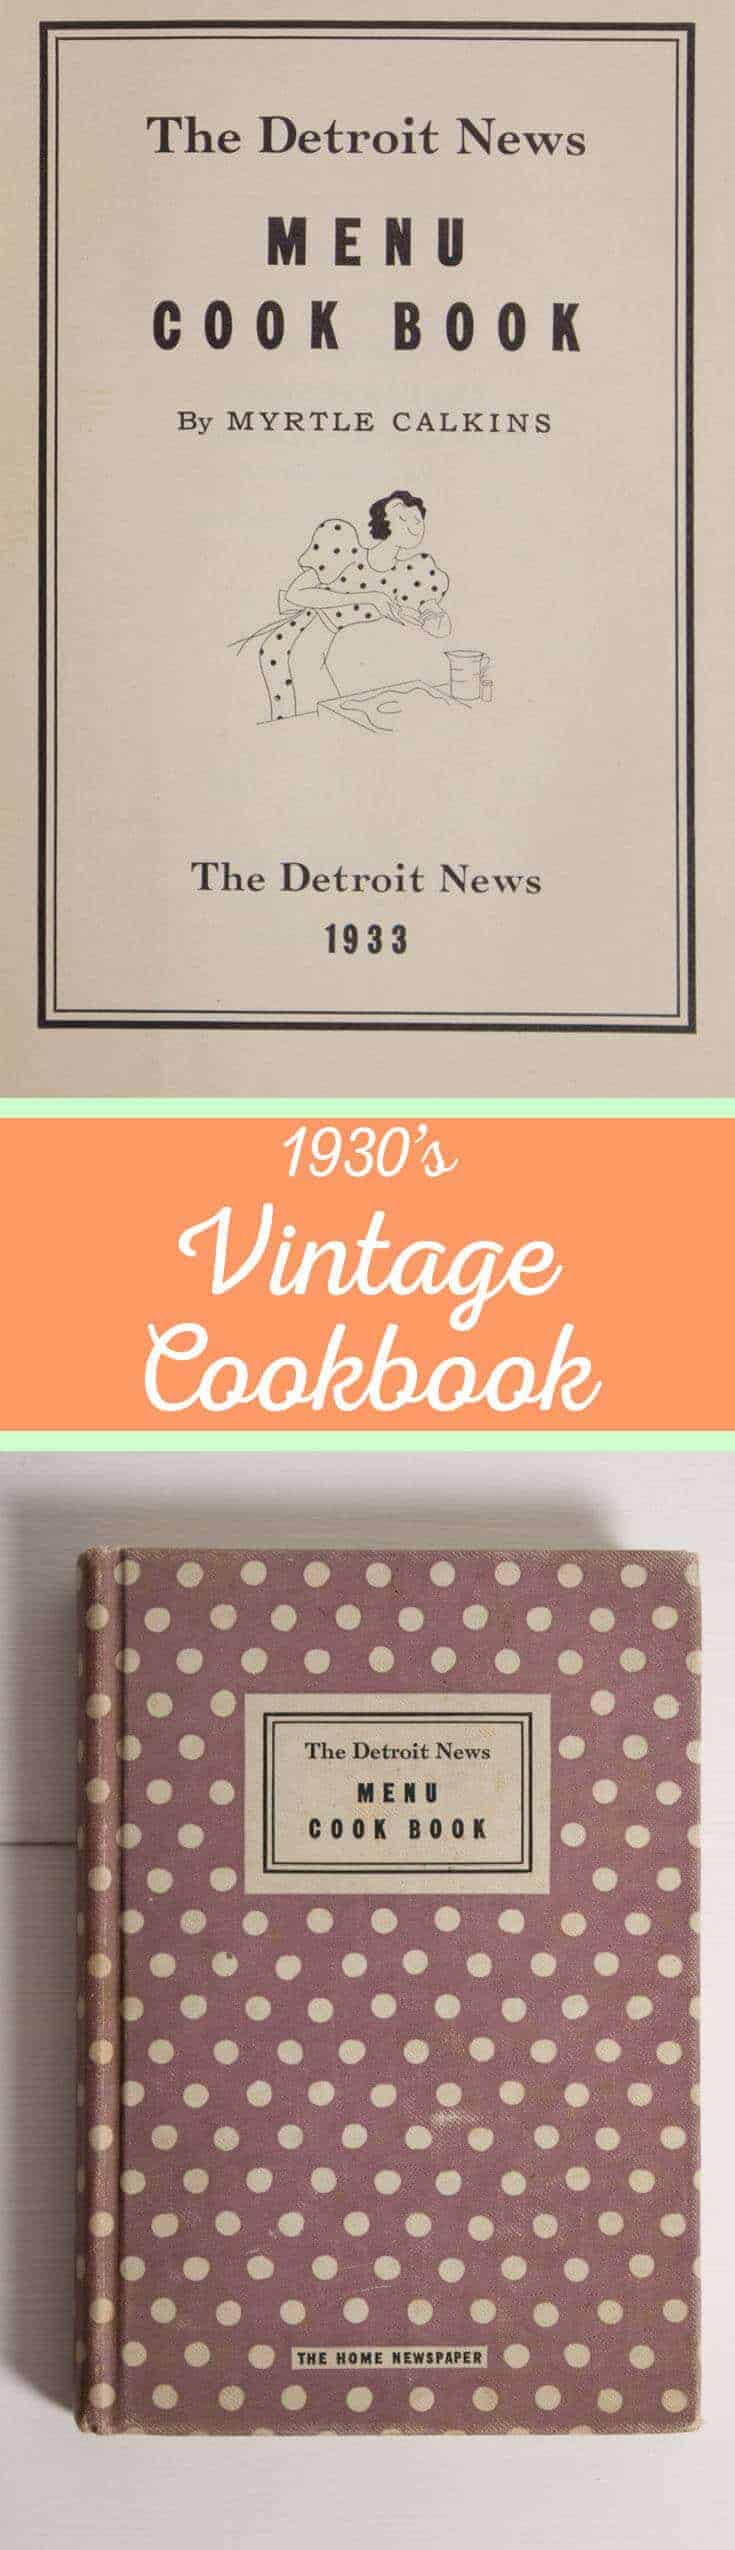 1930's Vintage Cookbook - The Detroit News Menu Cook Book